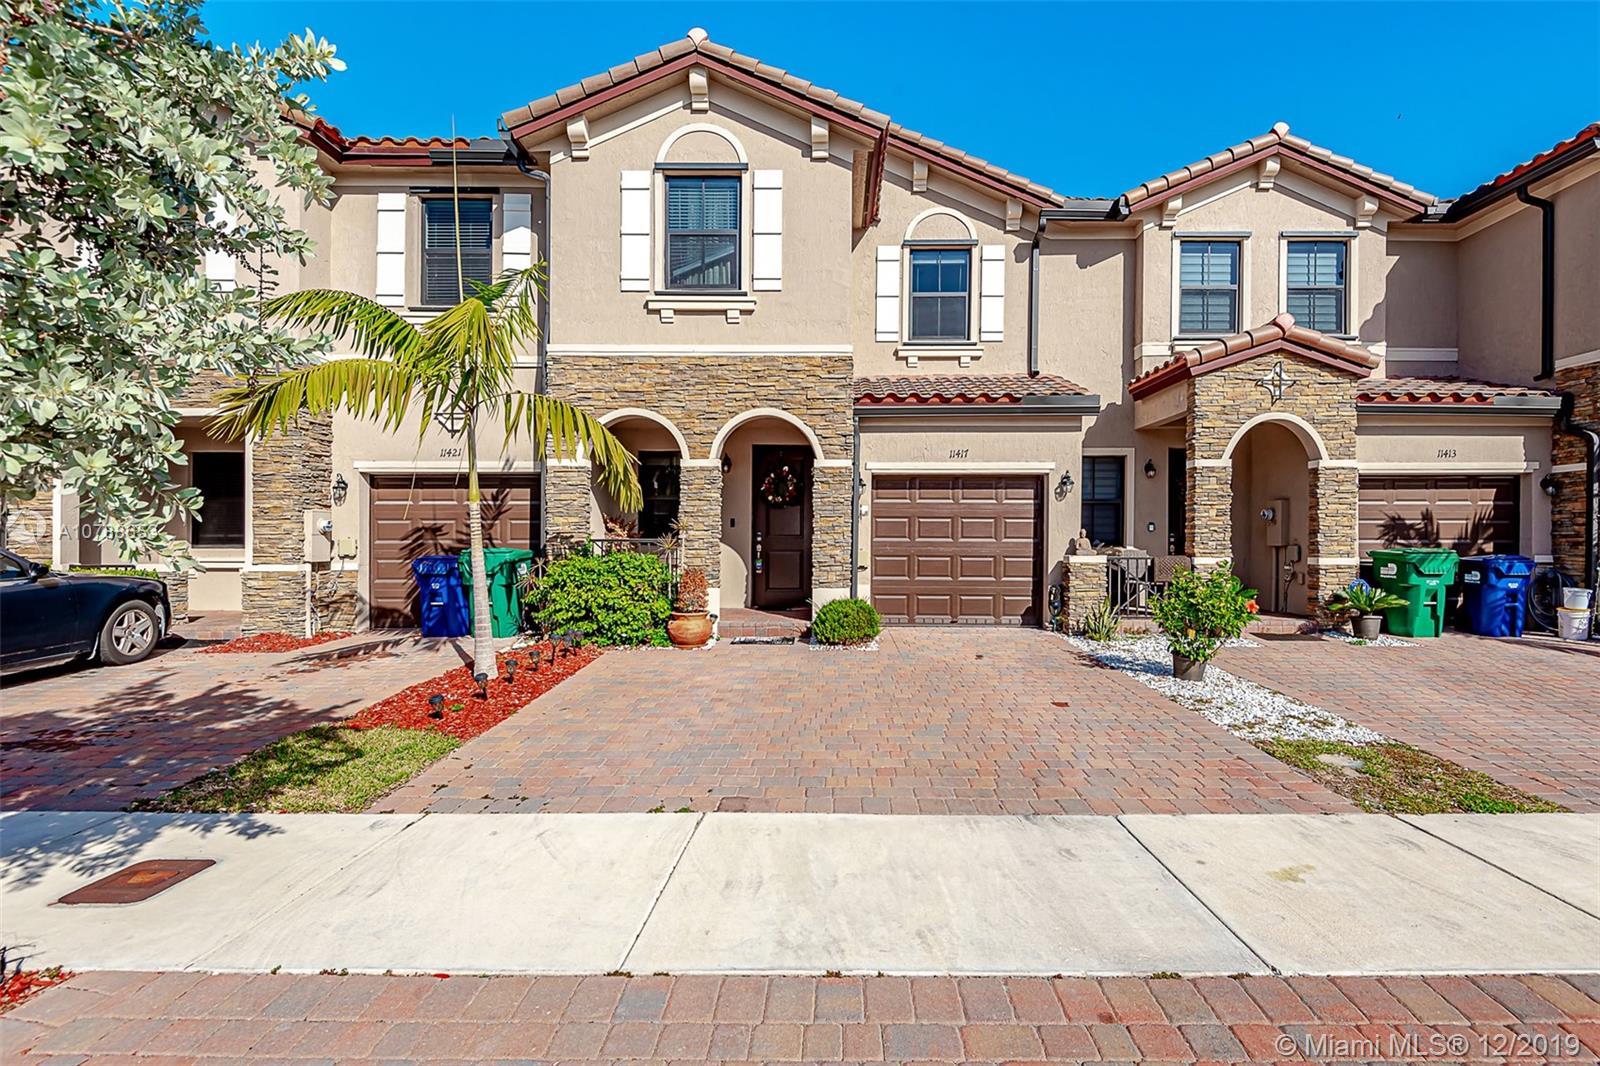 11417 SW 252nd St, Homestead, FL 33032 - Homestead, FL real estate listing